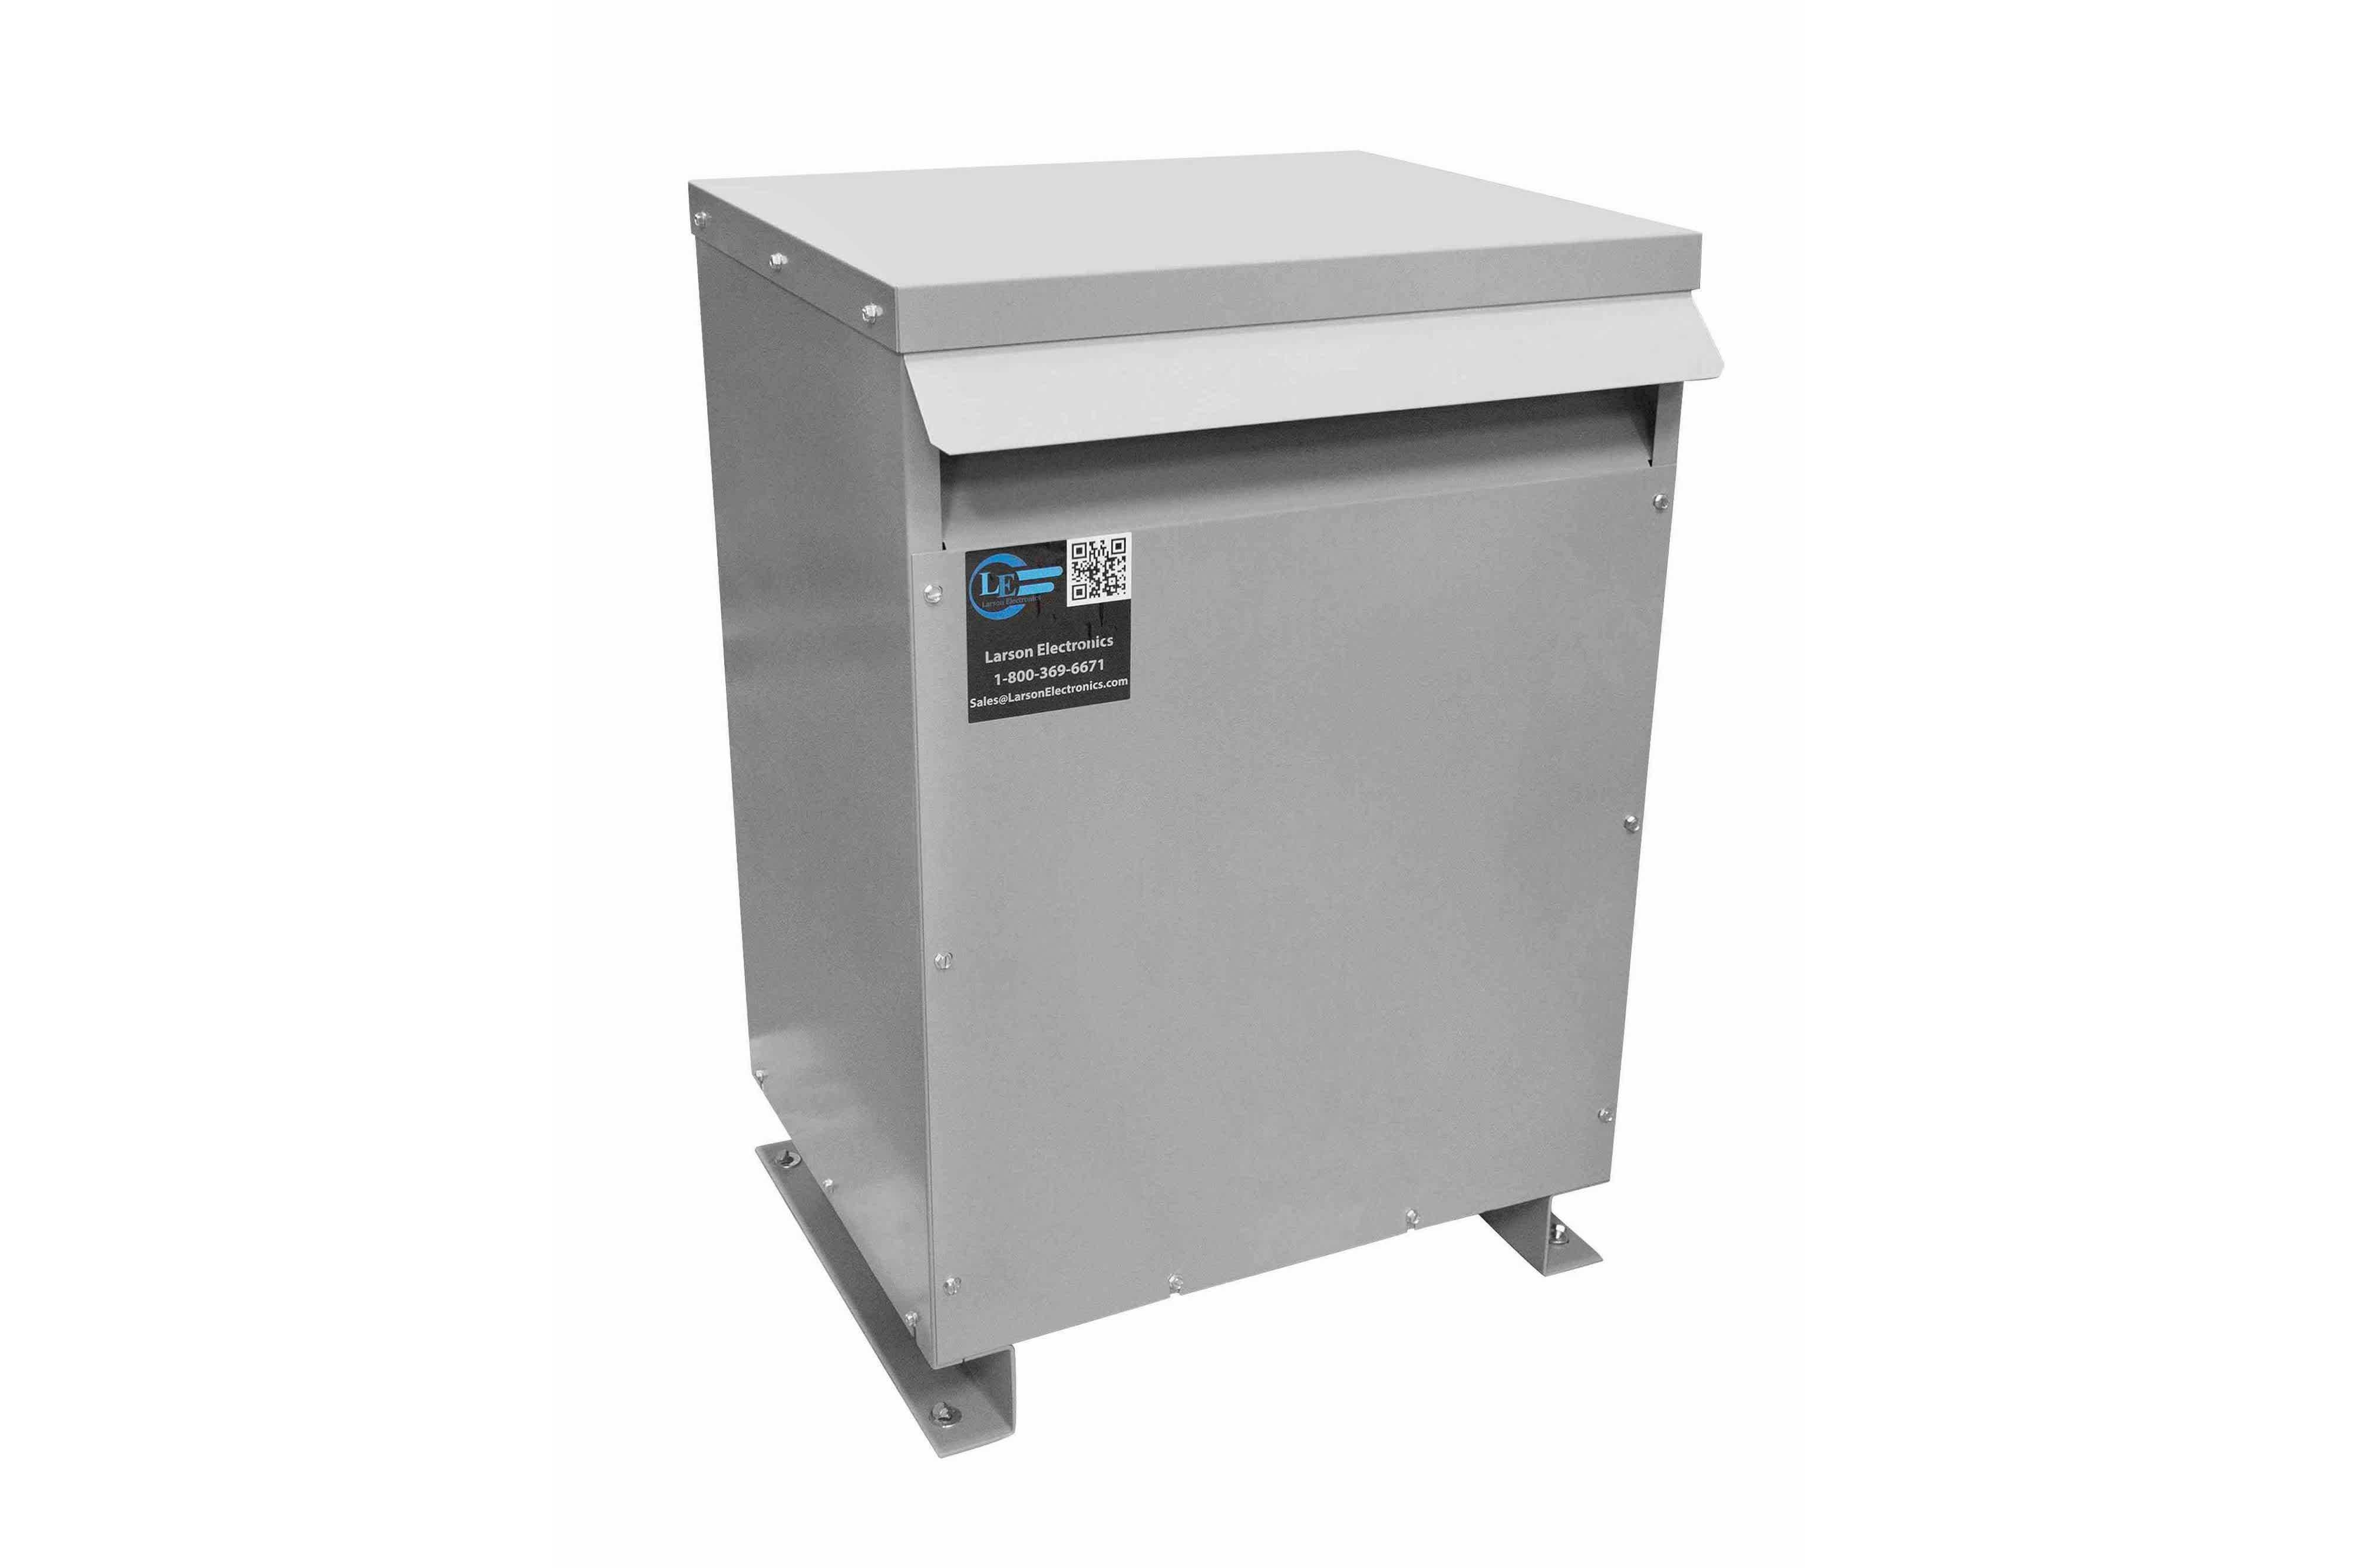 15 kVA 3PH Isolation Transformer, 600V Wye Primary, 480V Delta Secondary, N3R, Ventilated, 60 Hz